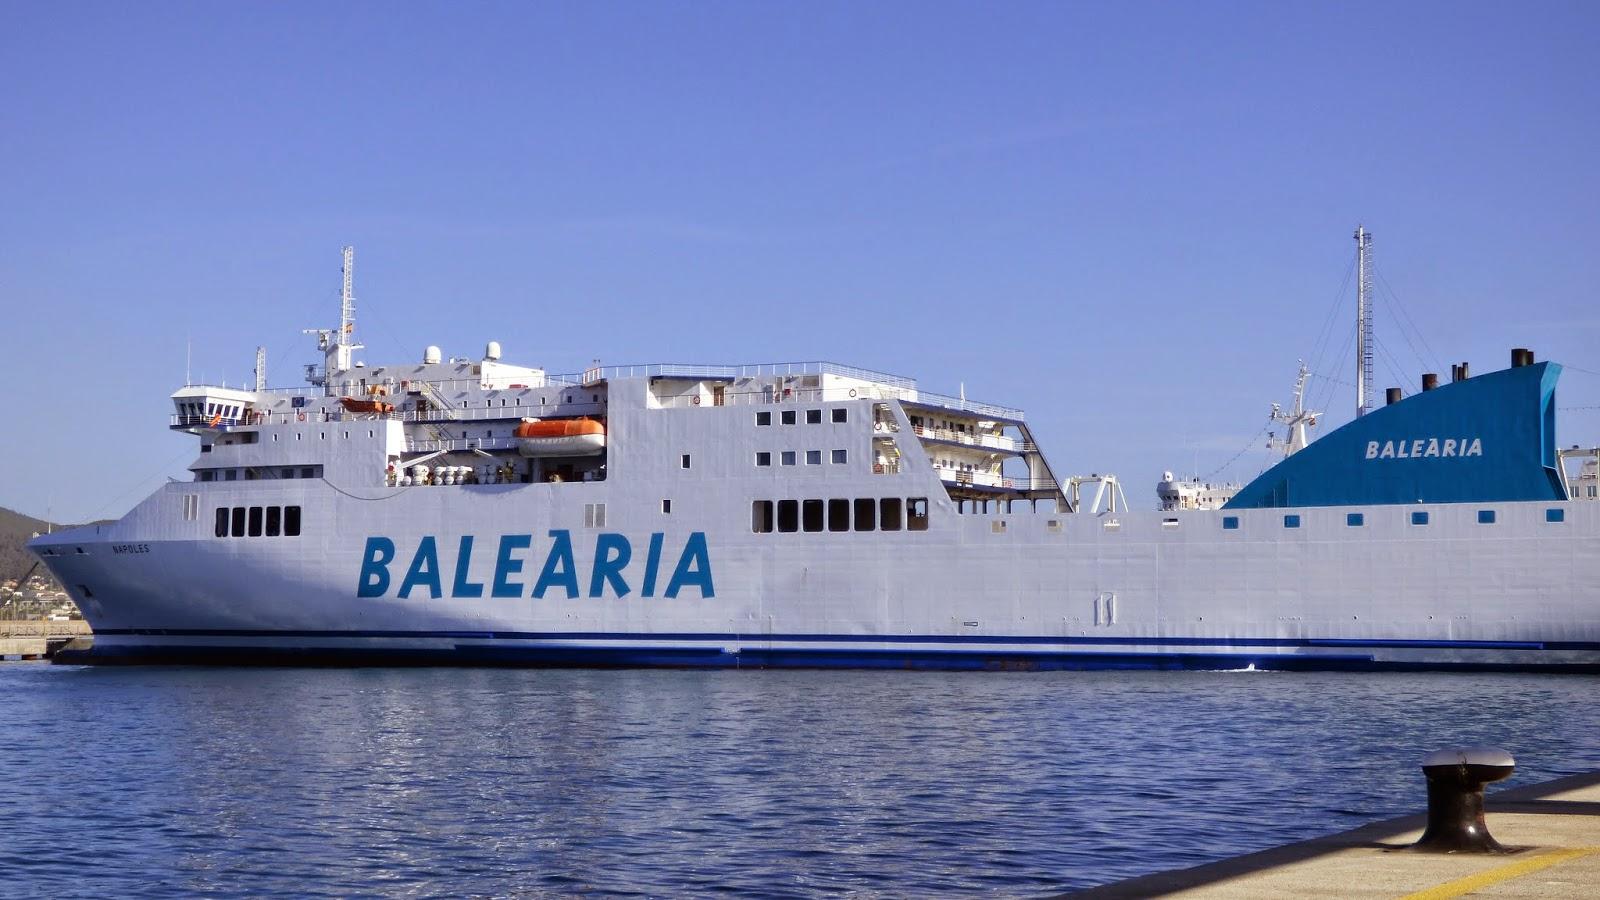 Ferrybalear el ferry napoles de bale ria realiza su for Oficina balearia ibiza